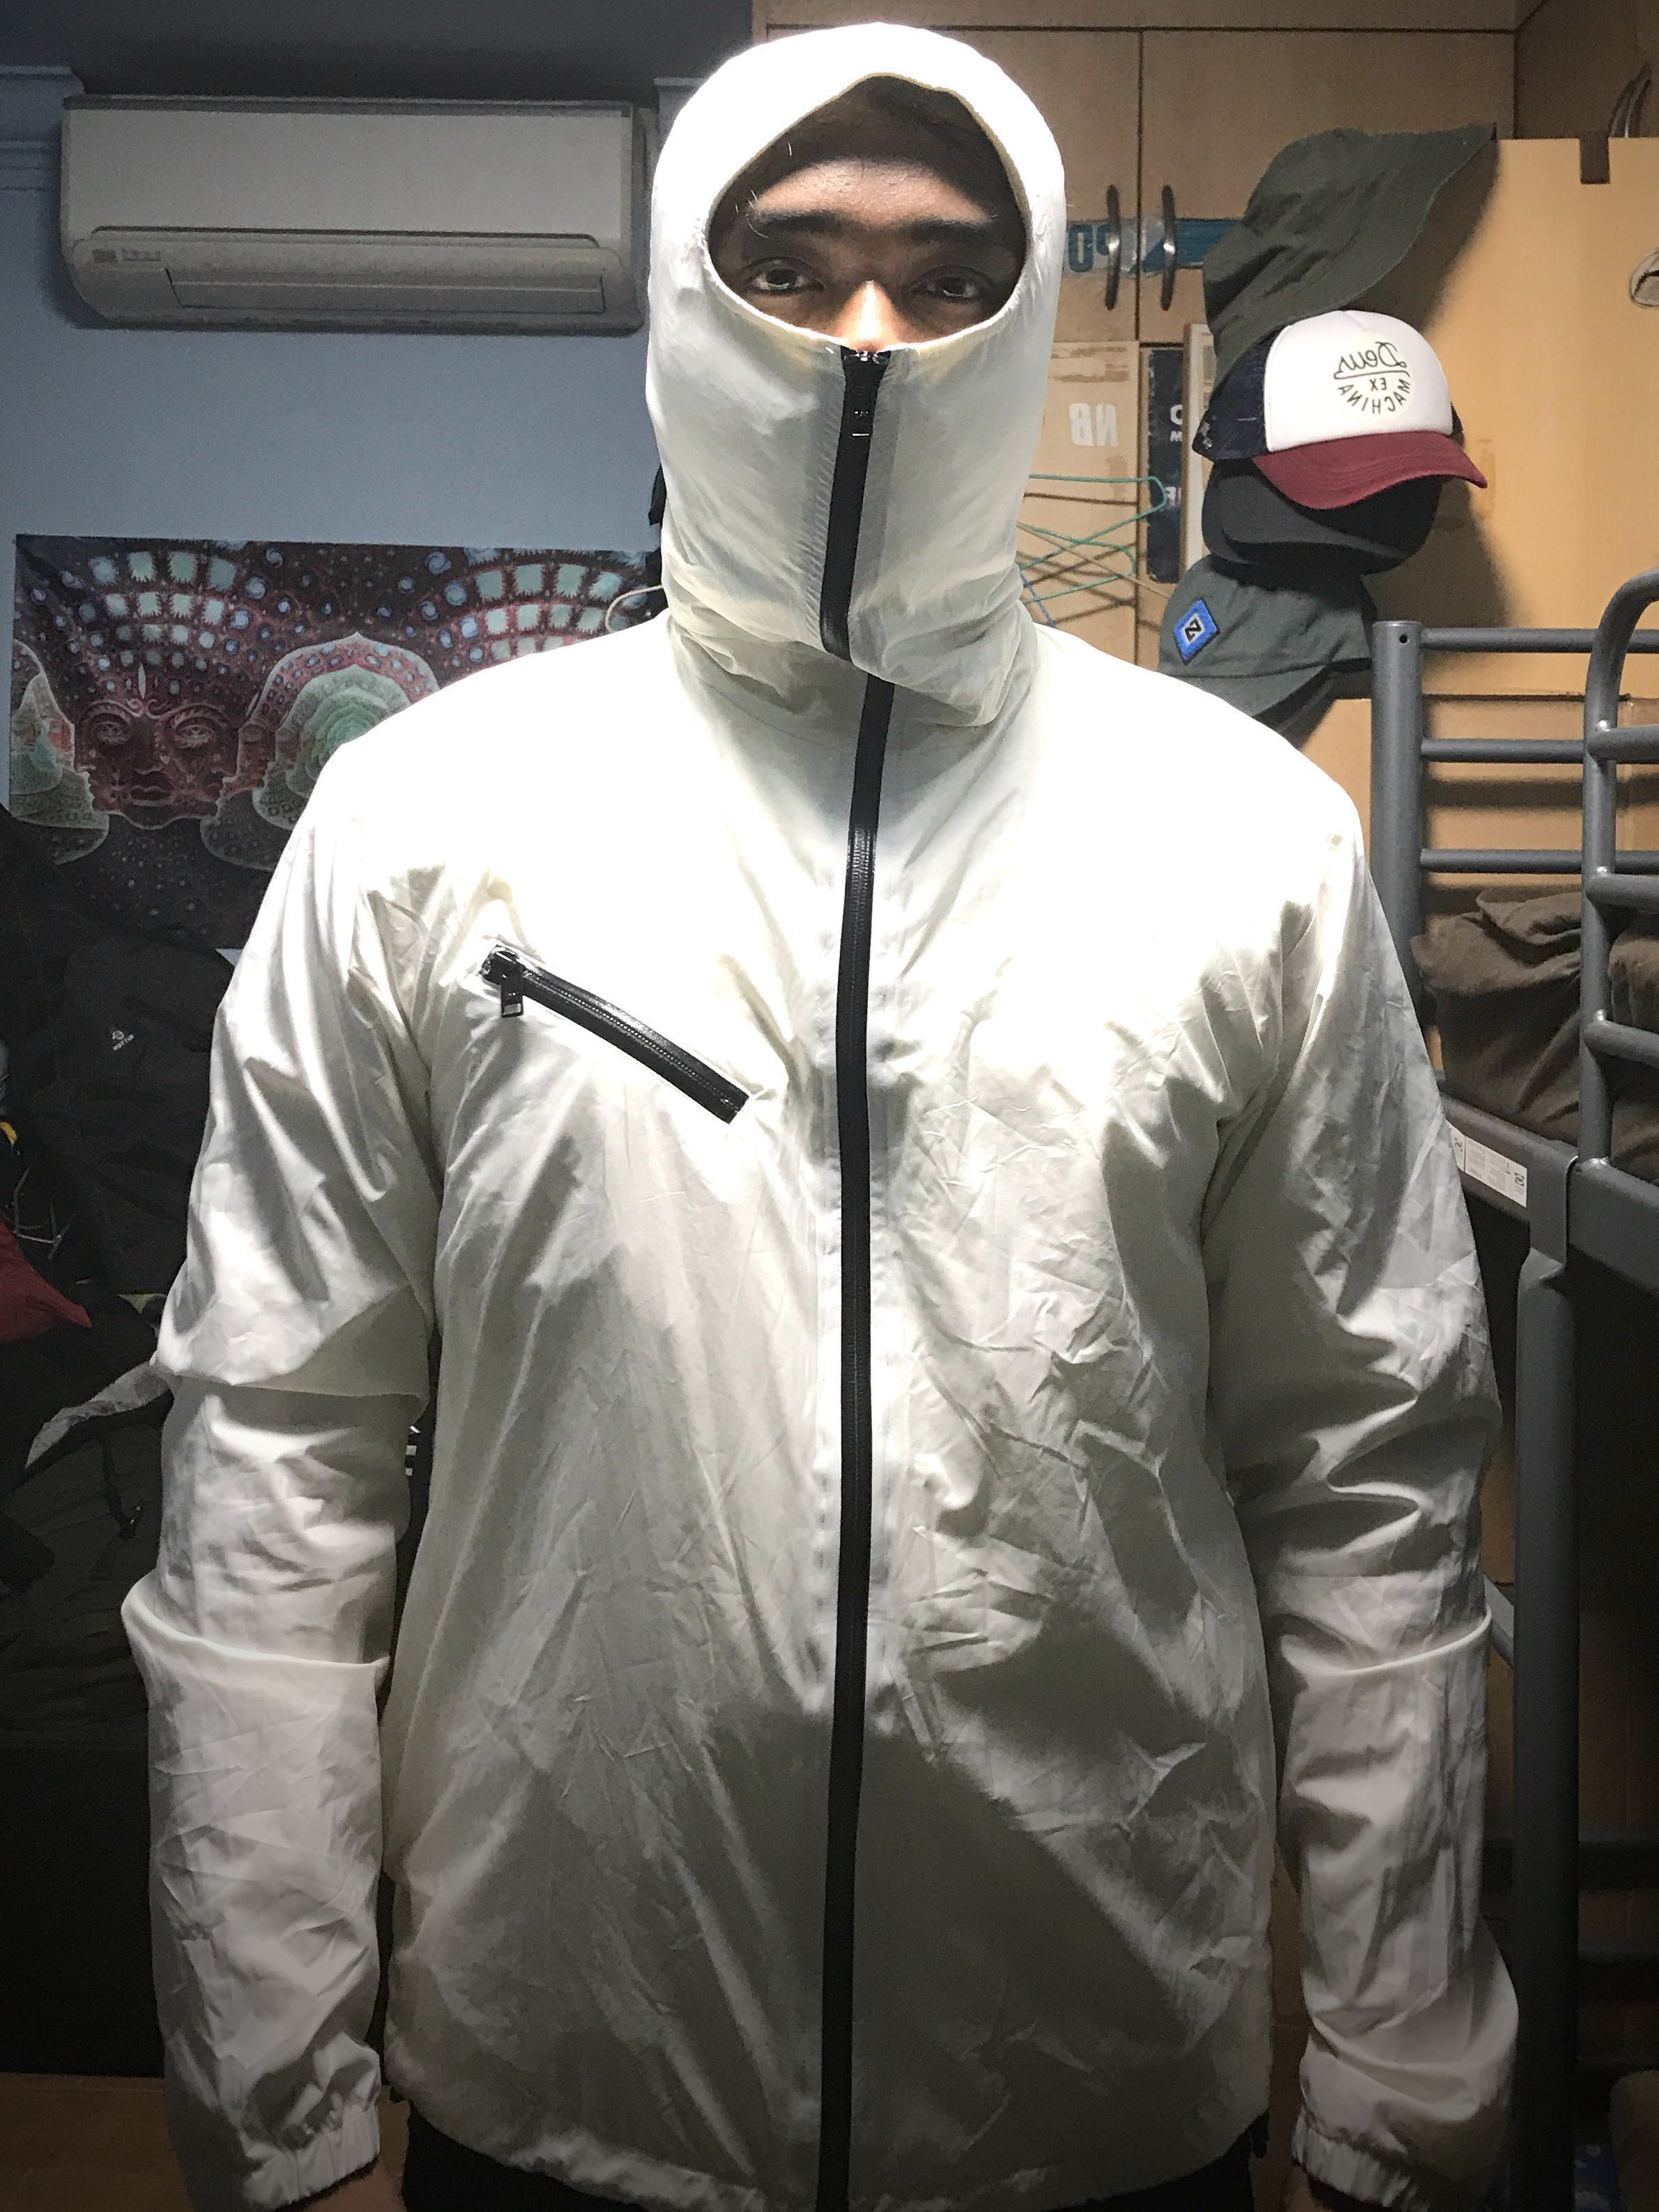 b141bb71dbf3 Y-3 Adidas Y3 Ninja zip hoodie - Size M